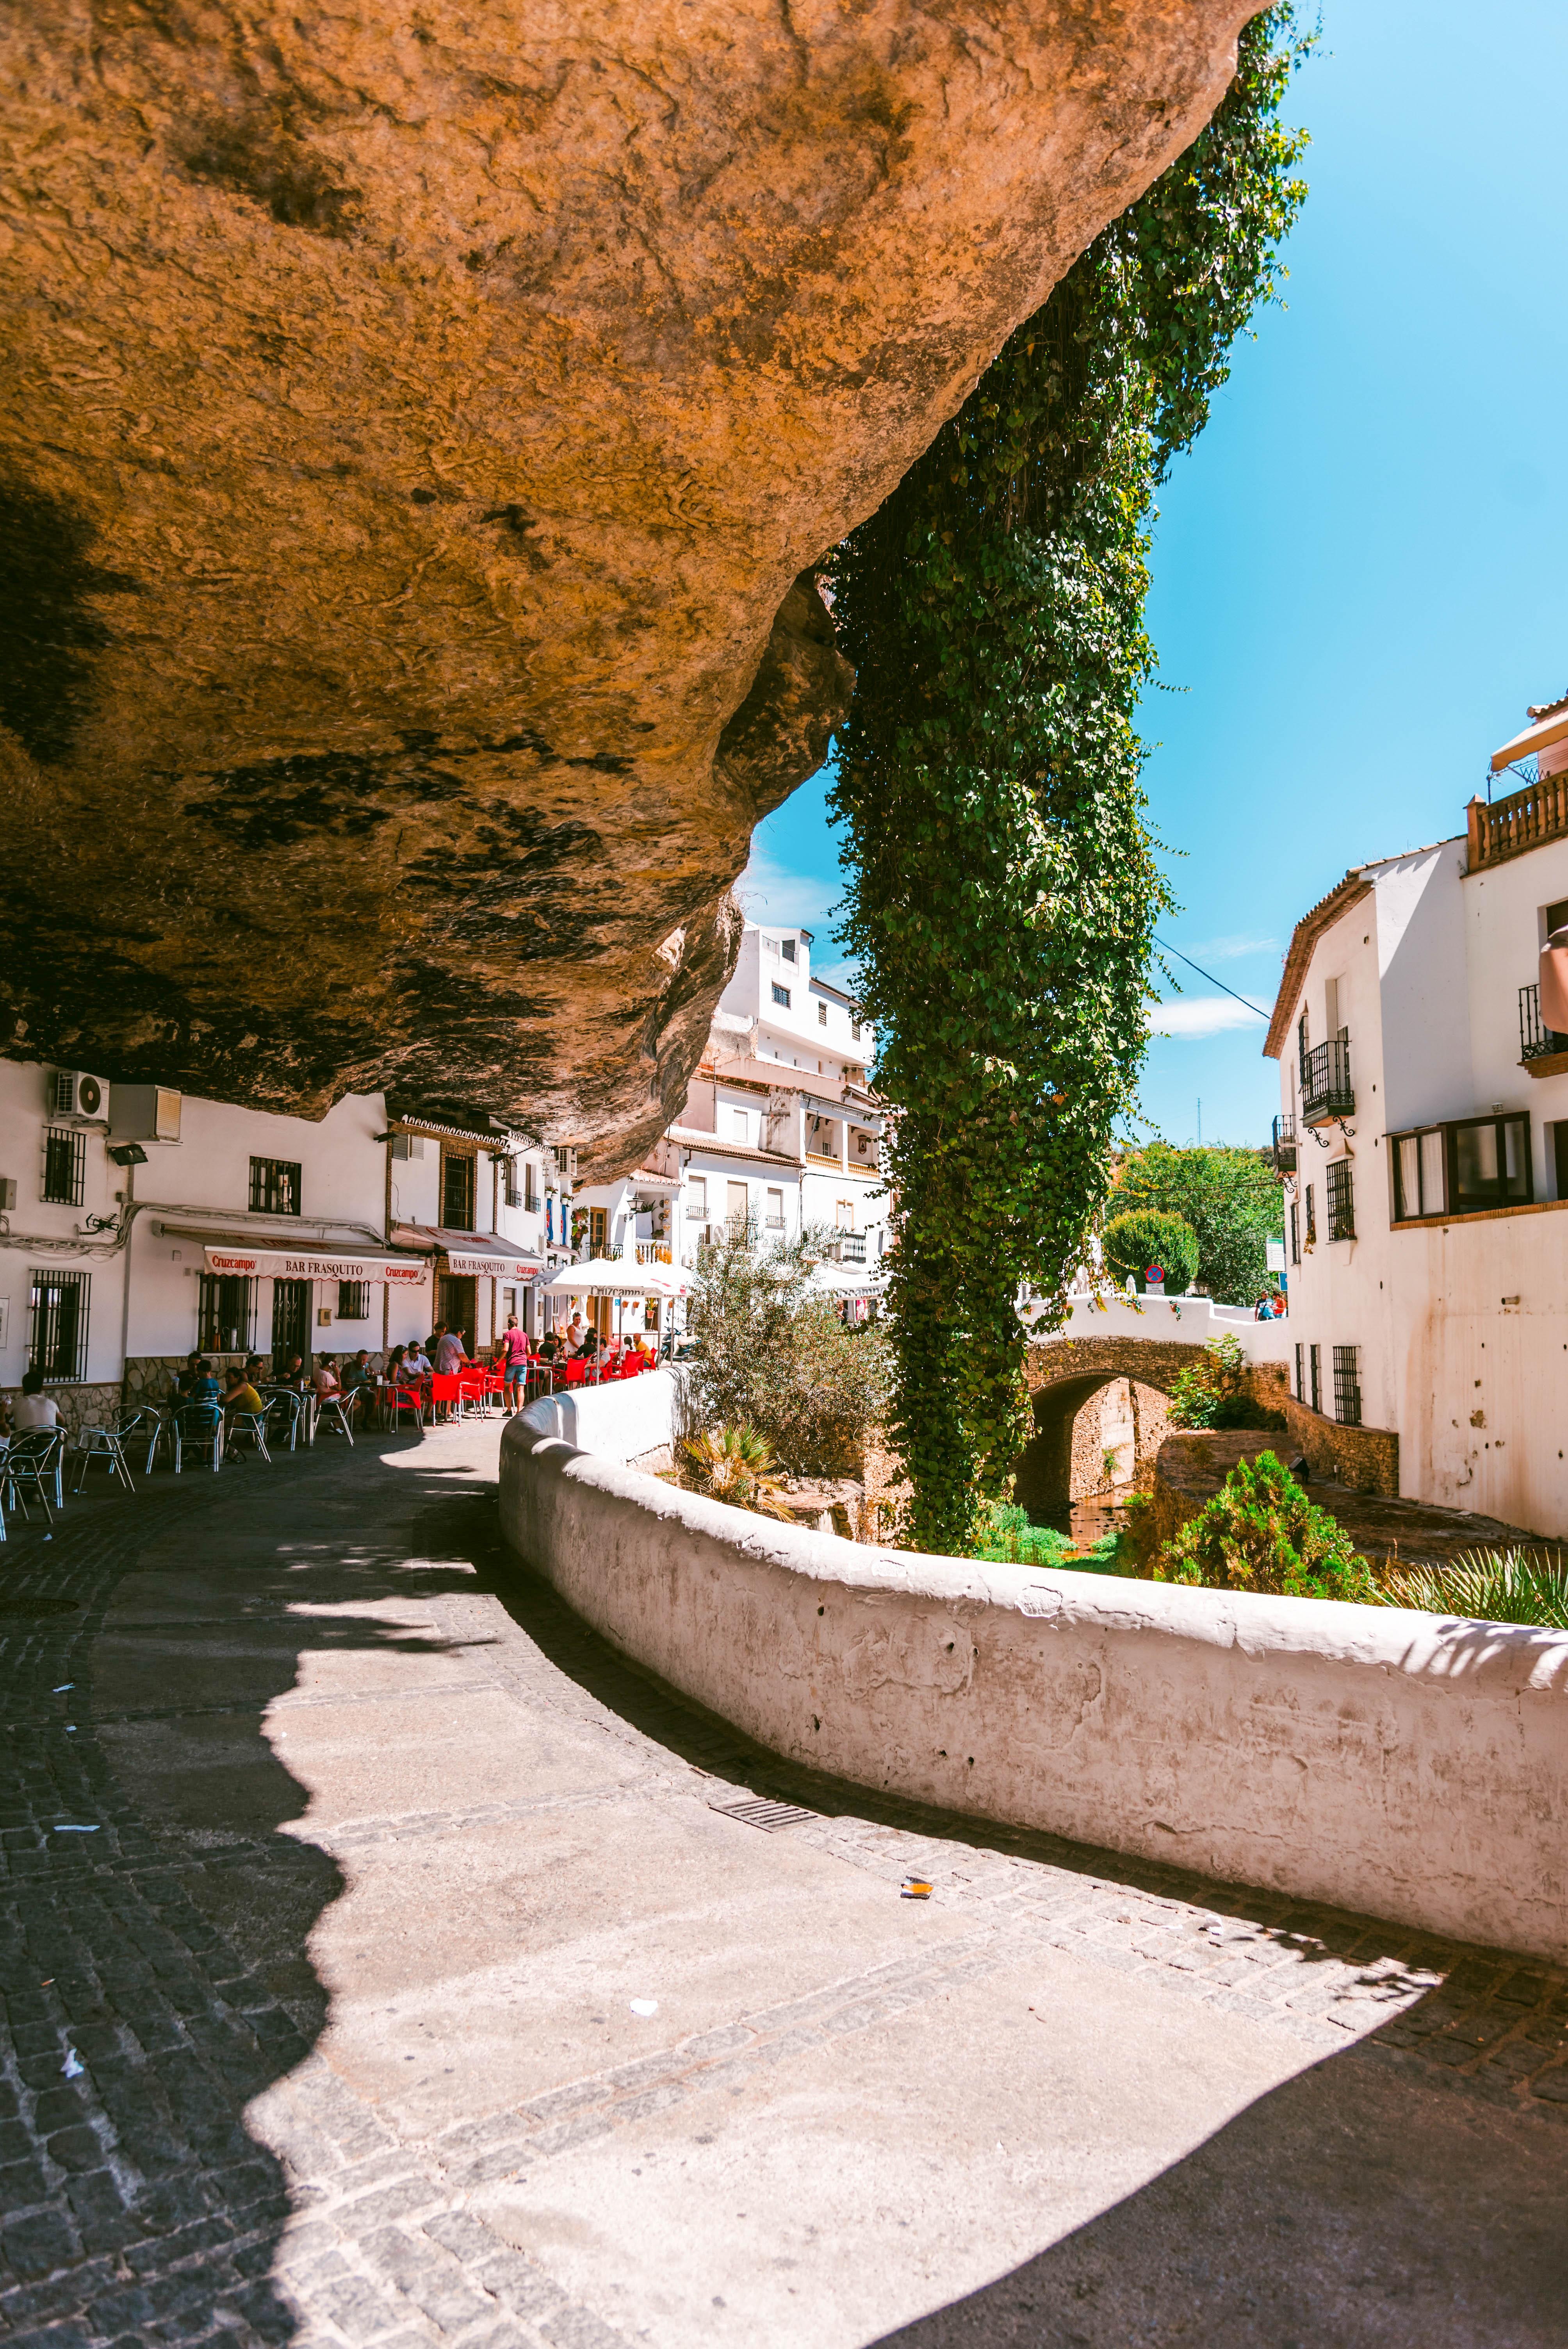 Іспанія Андалусія Сетеніль де лас Бодегас